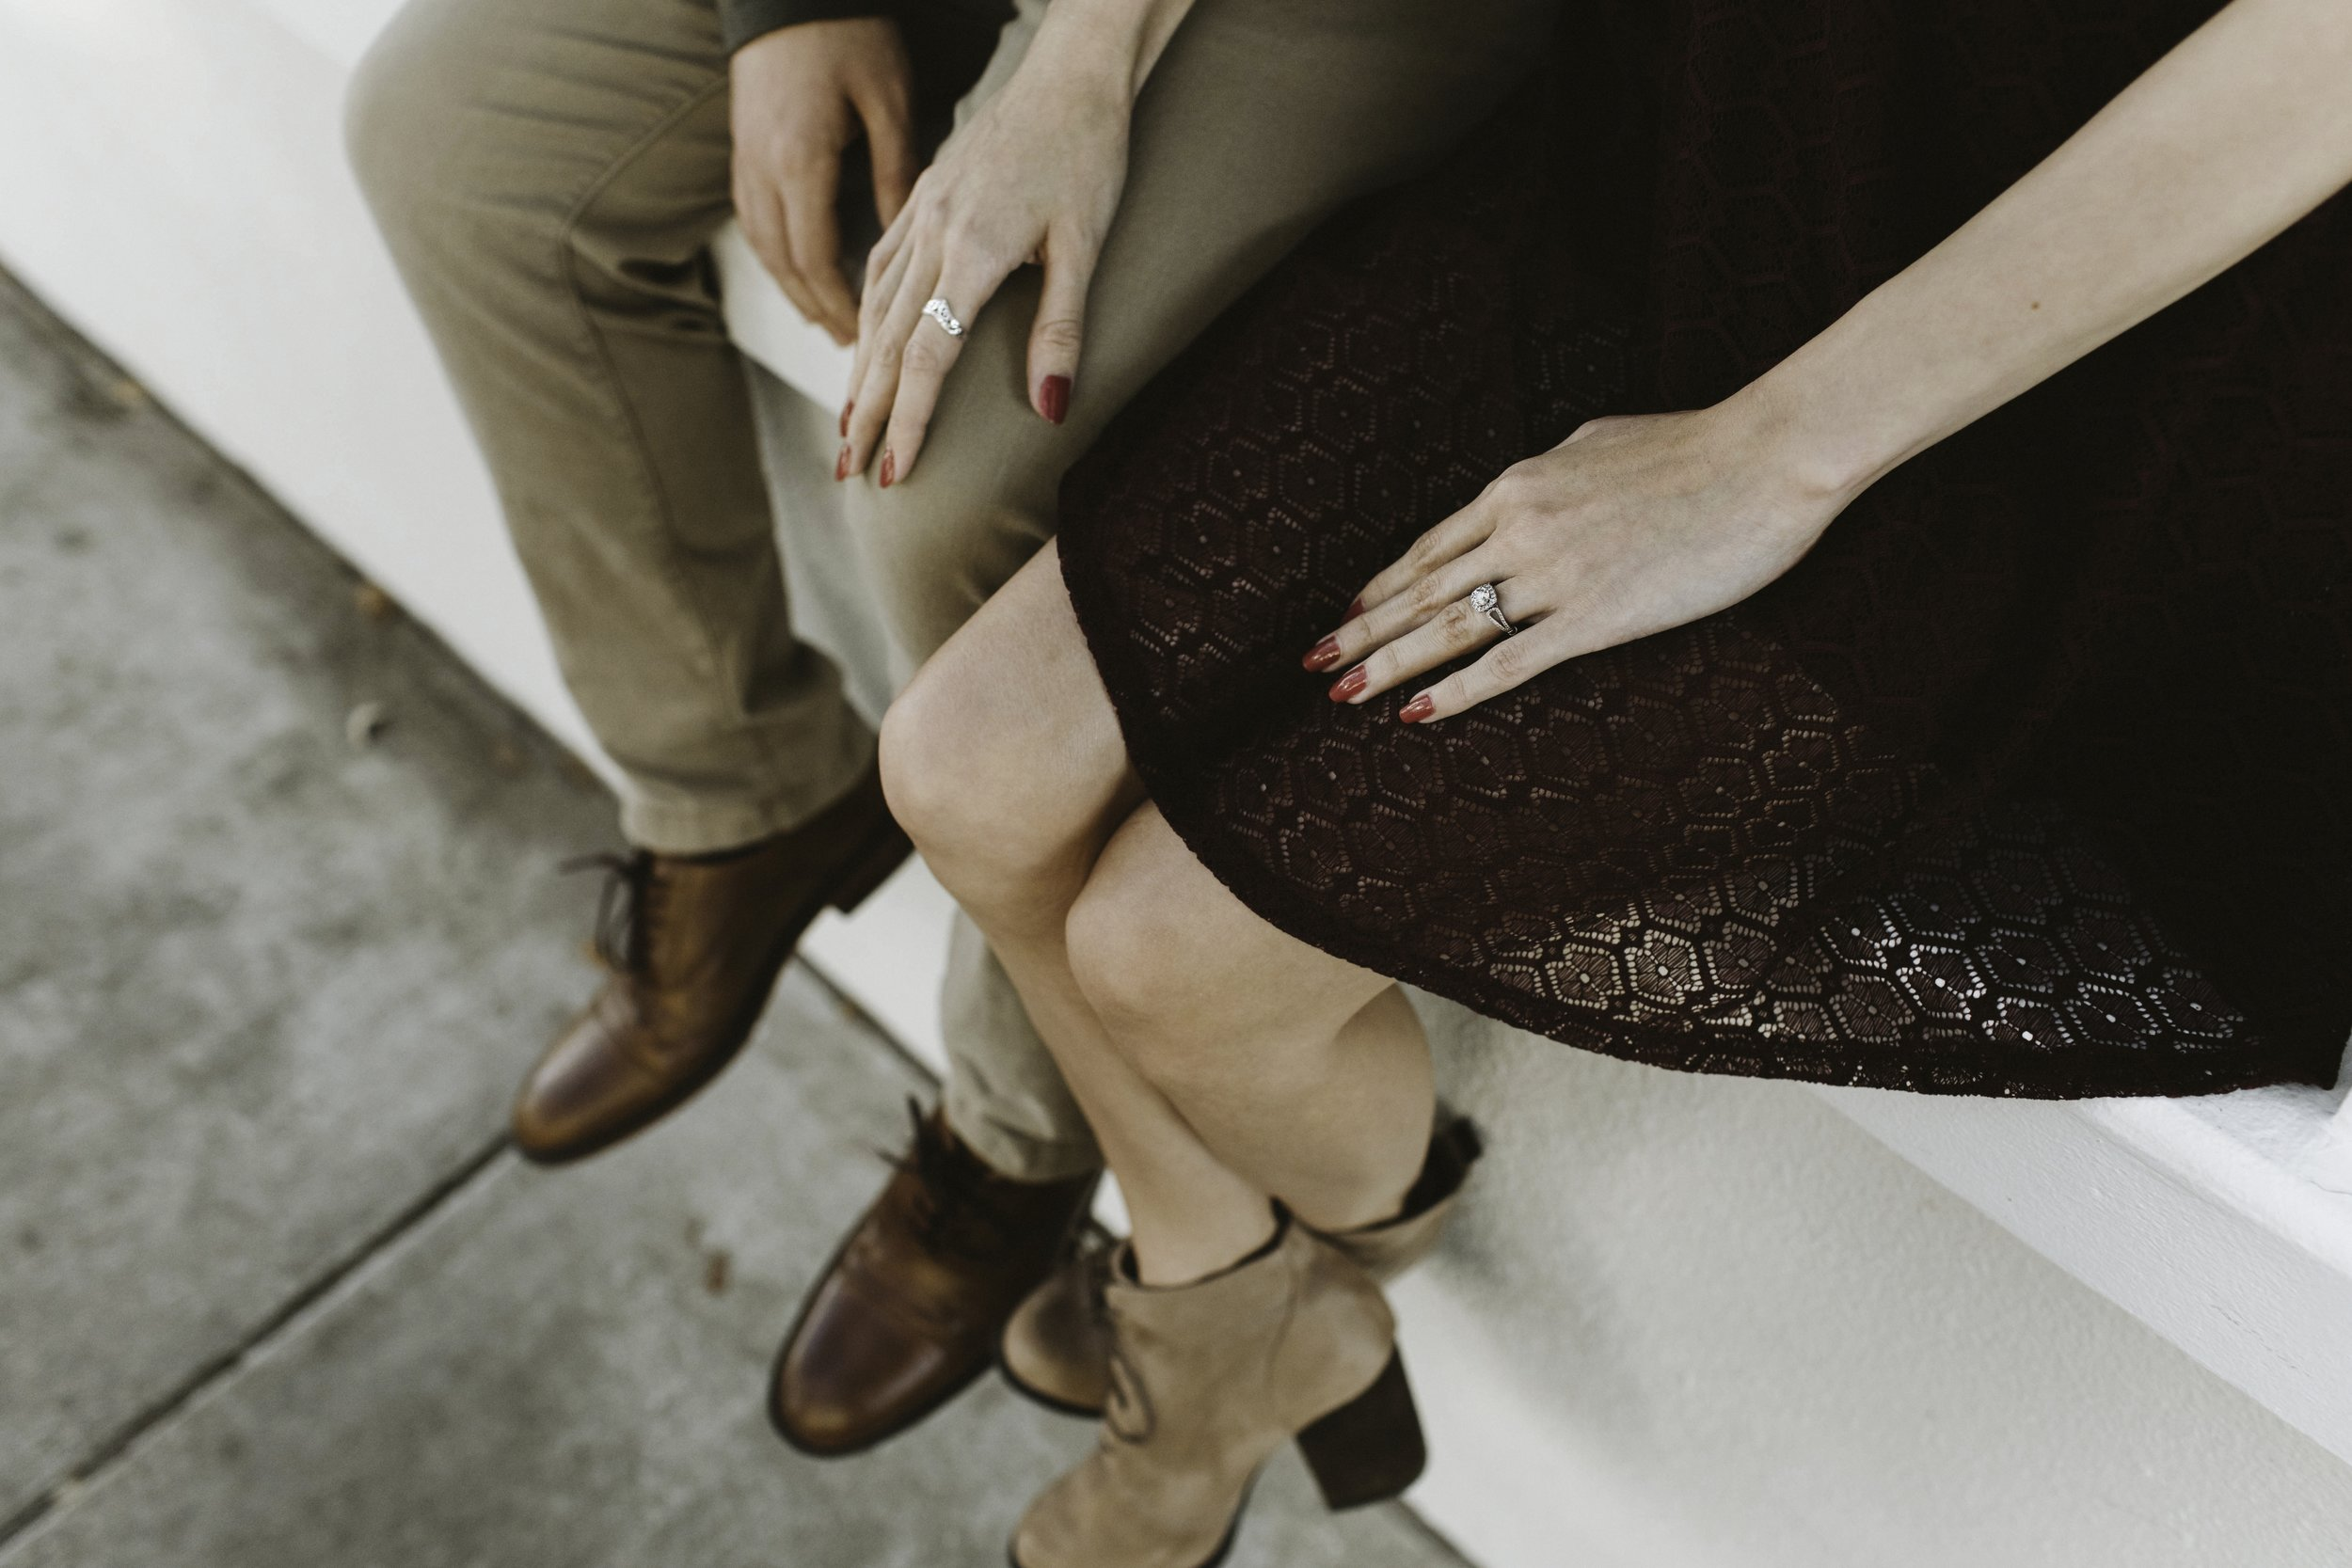 Grant & Carlynn - A quaint engagement session in Celebration, Florida